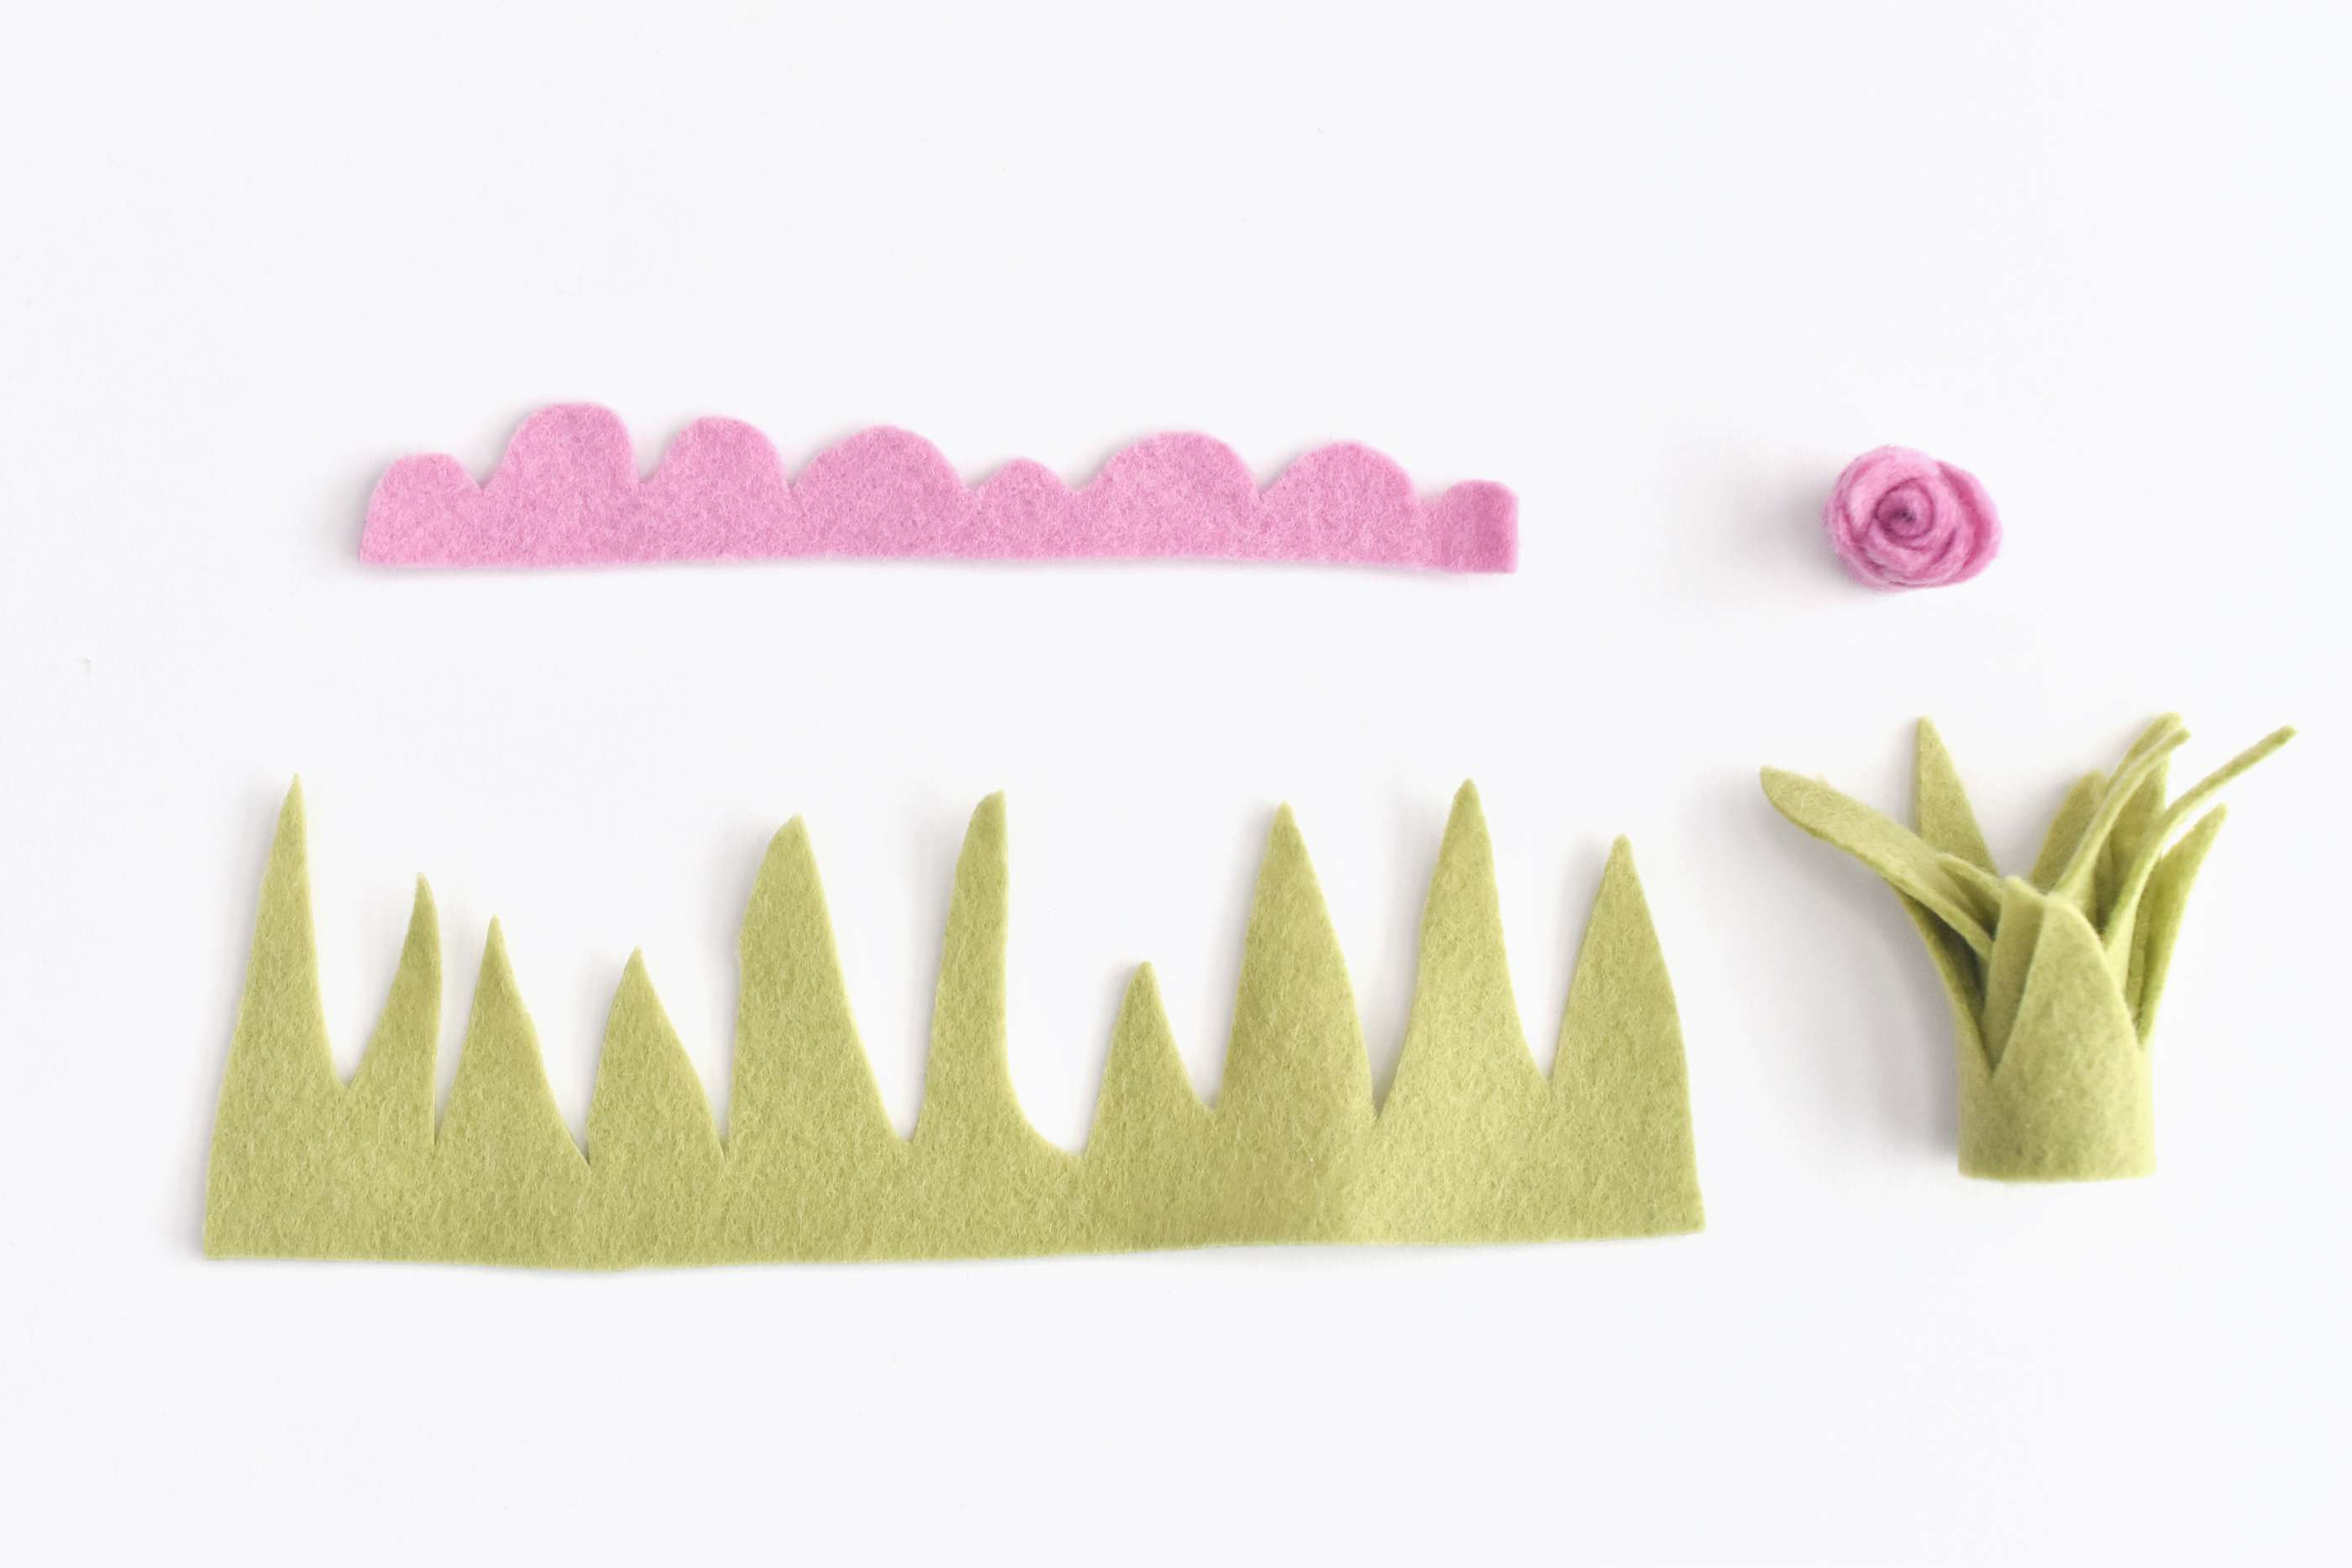 Cut Felt and Roll it to Make Plants